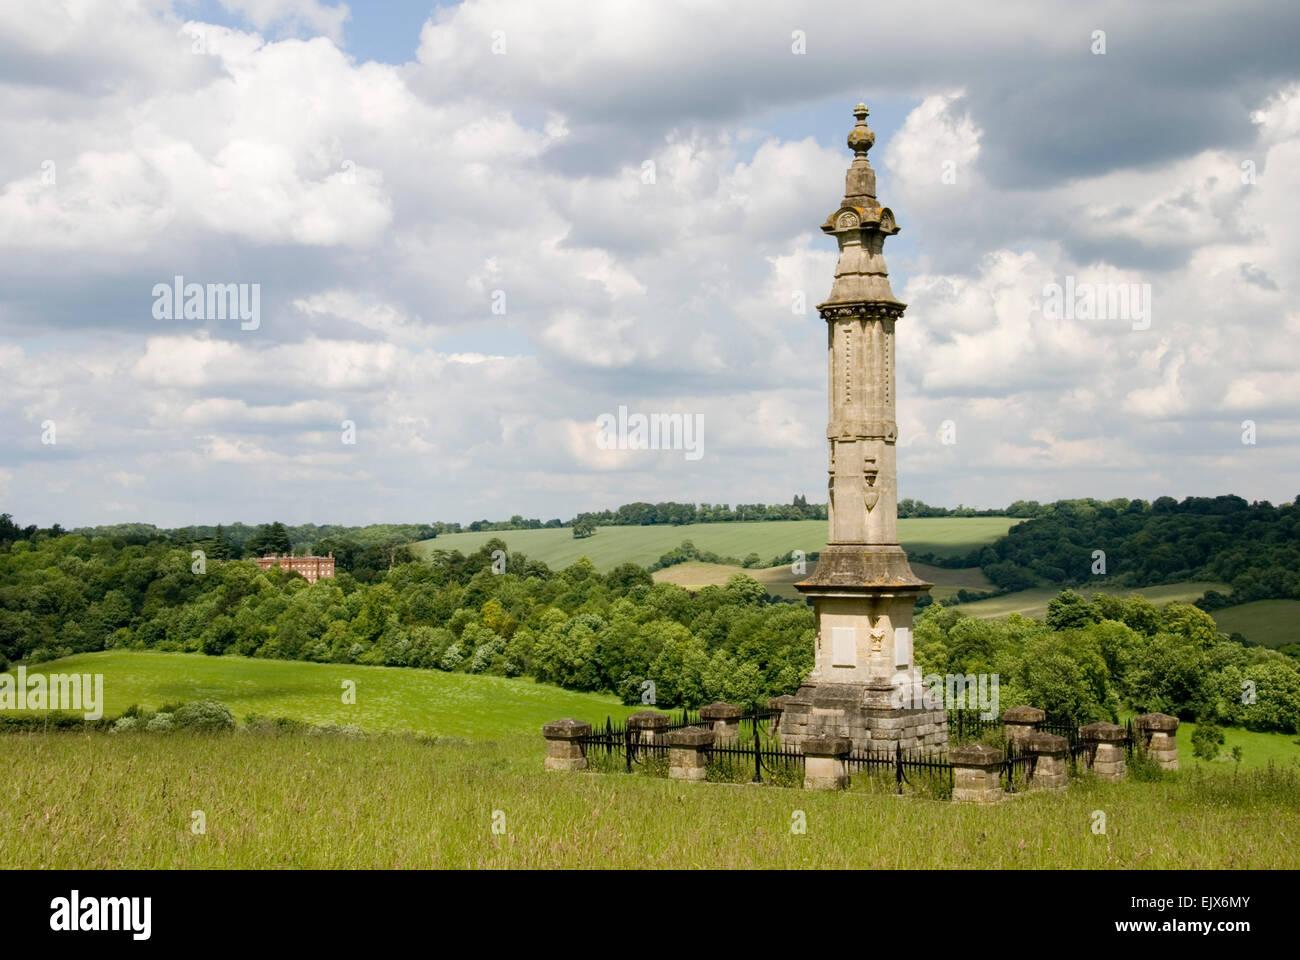 Bucks - Chilterns - Hughenden - hill top monument to Isaac D'Israeli - Benjamin Disraeli's father - Hughenden manor Stock Photo